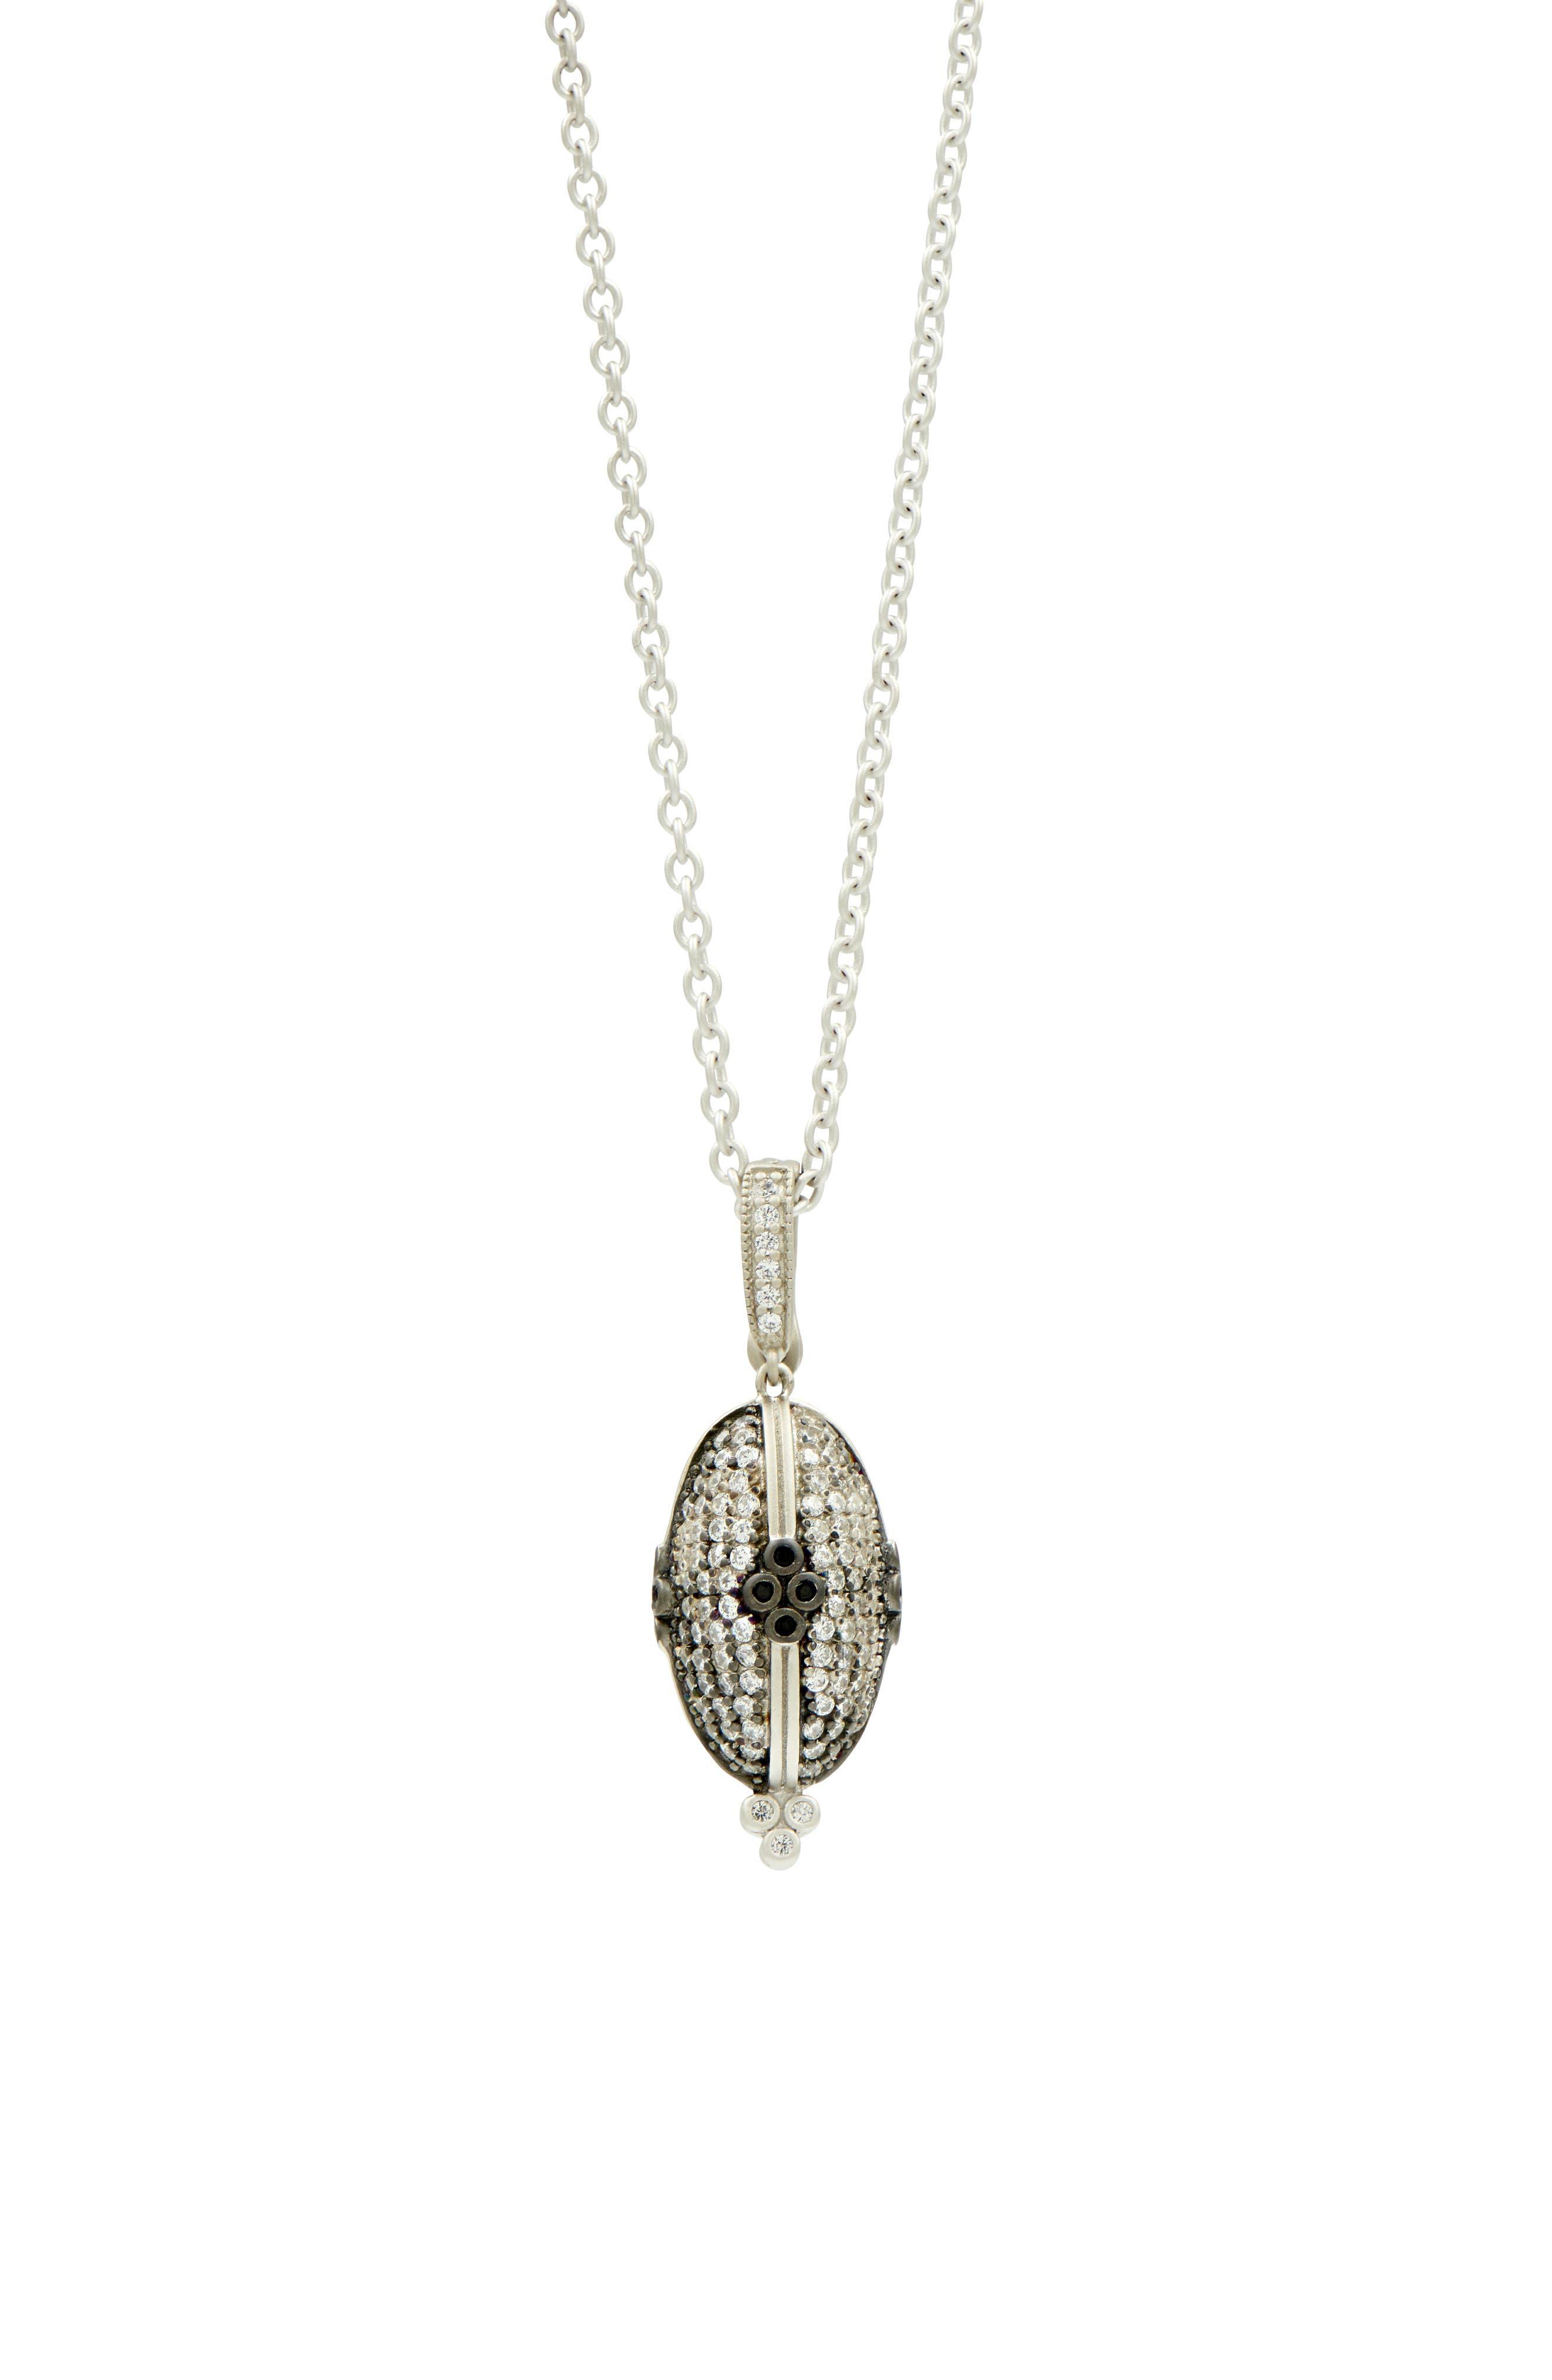 FREIDA ROTHMAN Industrial Finish Pendant Necklace in Black/ Silver